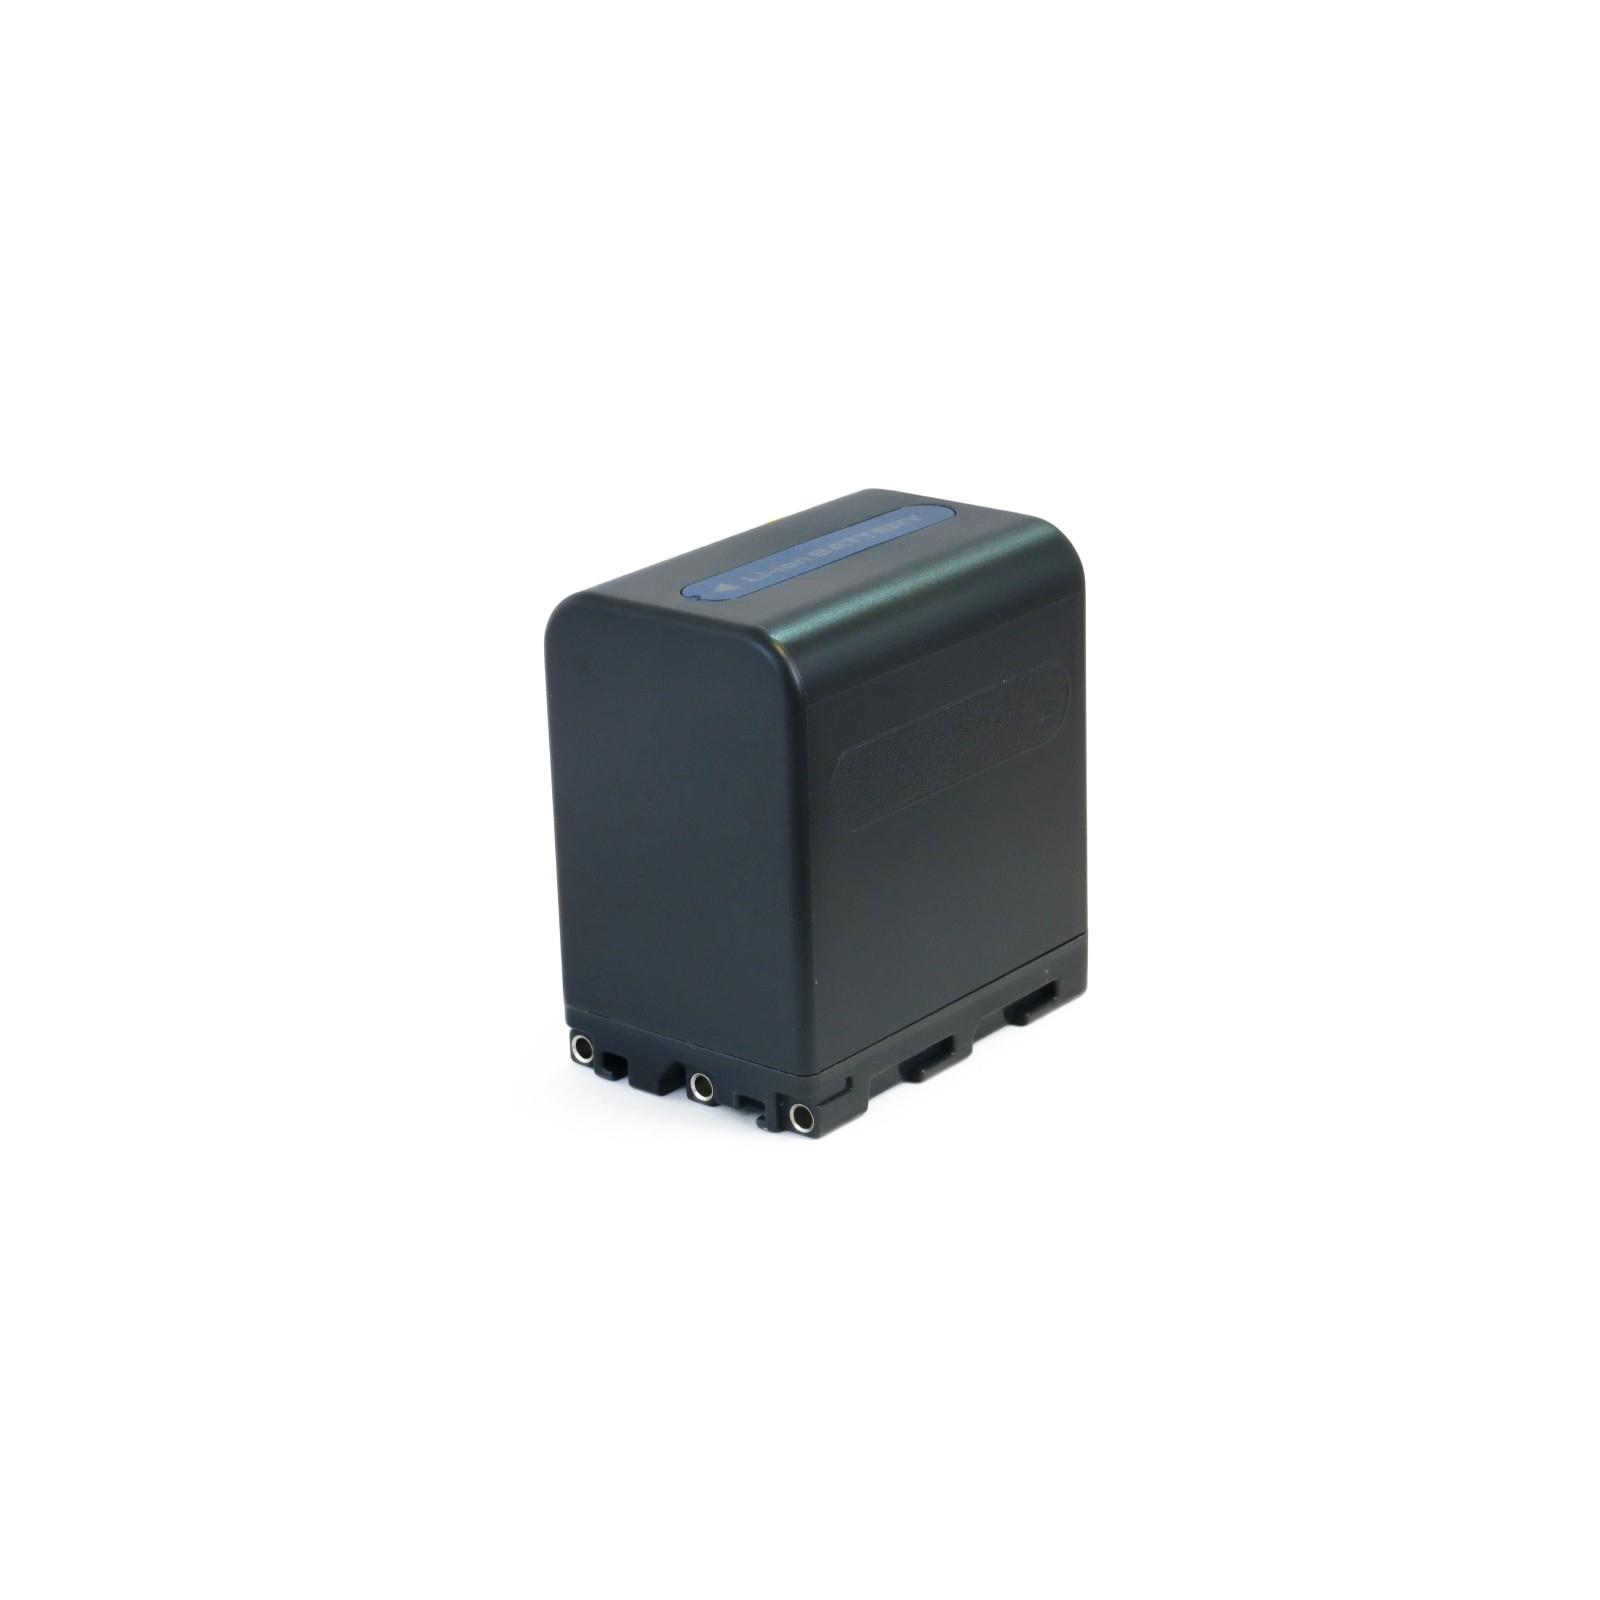 Аккумулятор к фото/видео EXTRADIGITAL Sony NP-QM91 (DV00DV1030) изображение 3